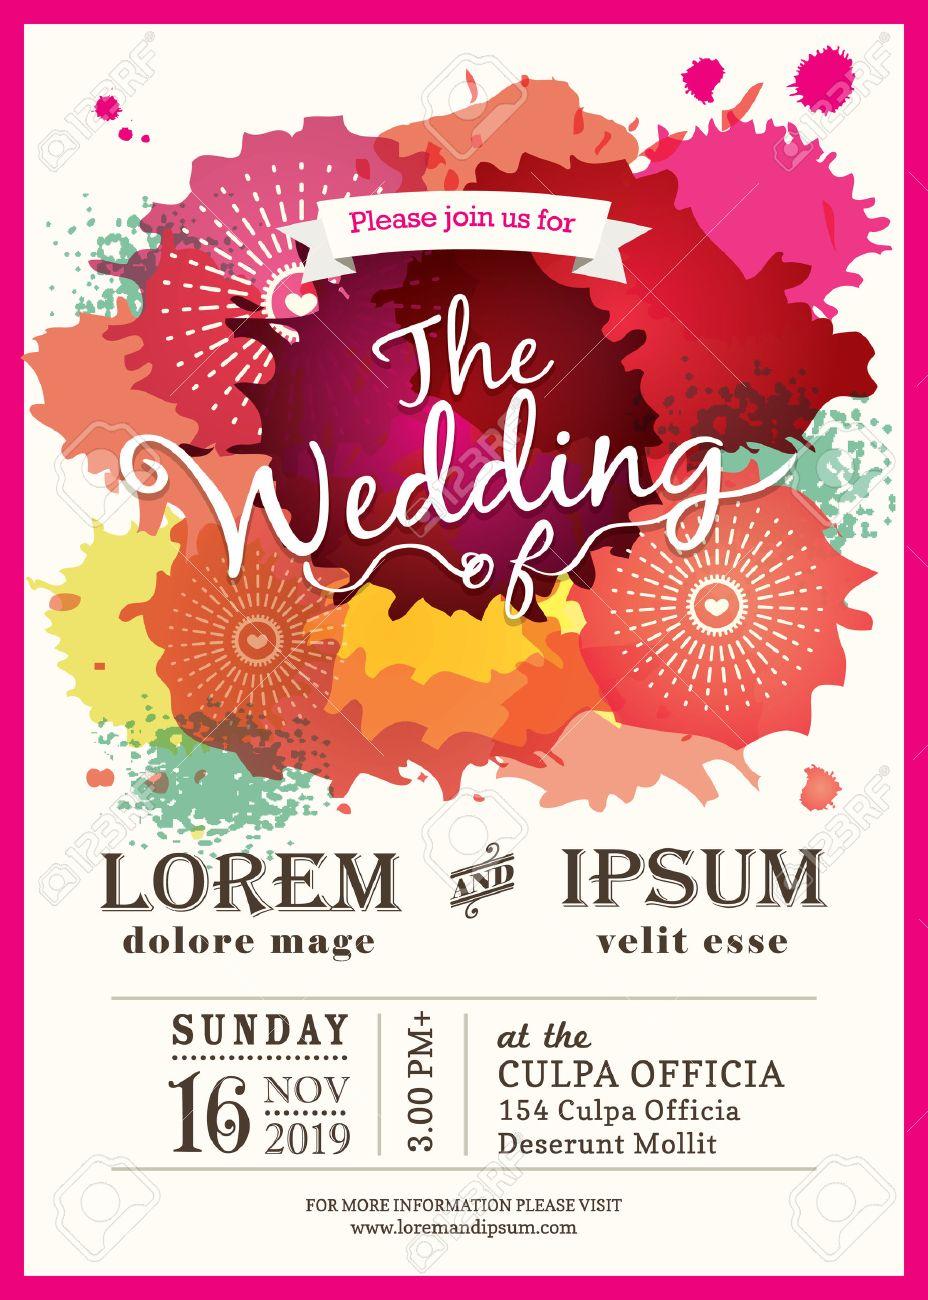 Color Splash Wedding Party Invitation Card Background Royalty Free